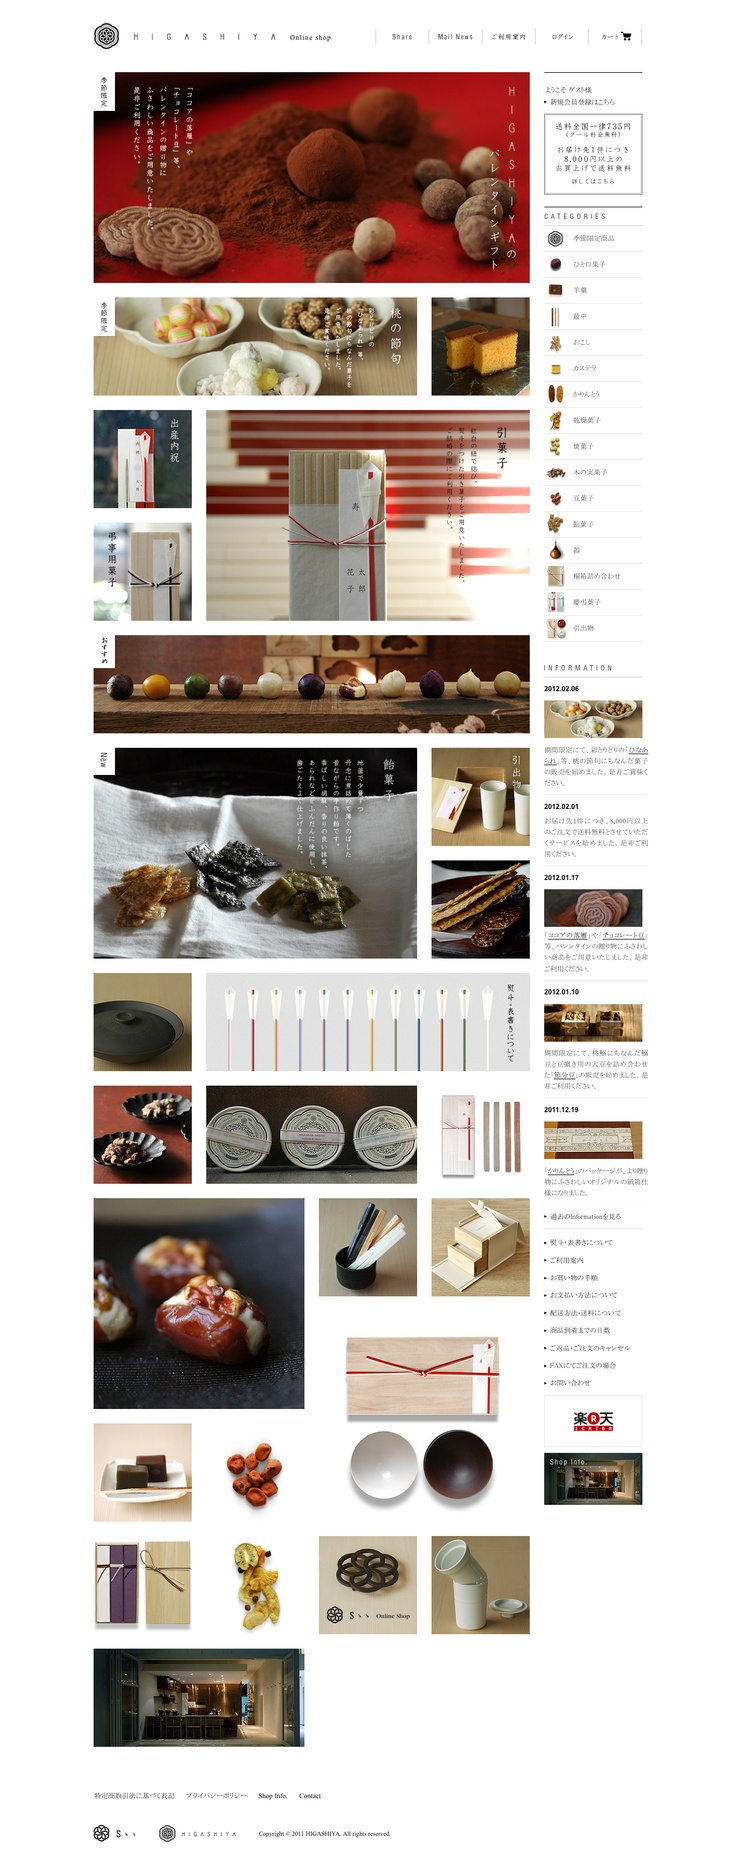 HIGASHIYA Online Shop http://higashiya-shop.com/